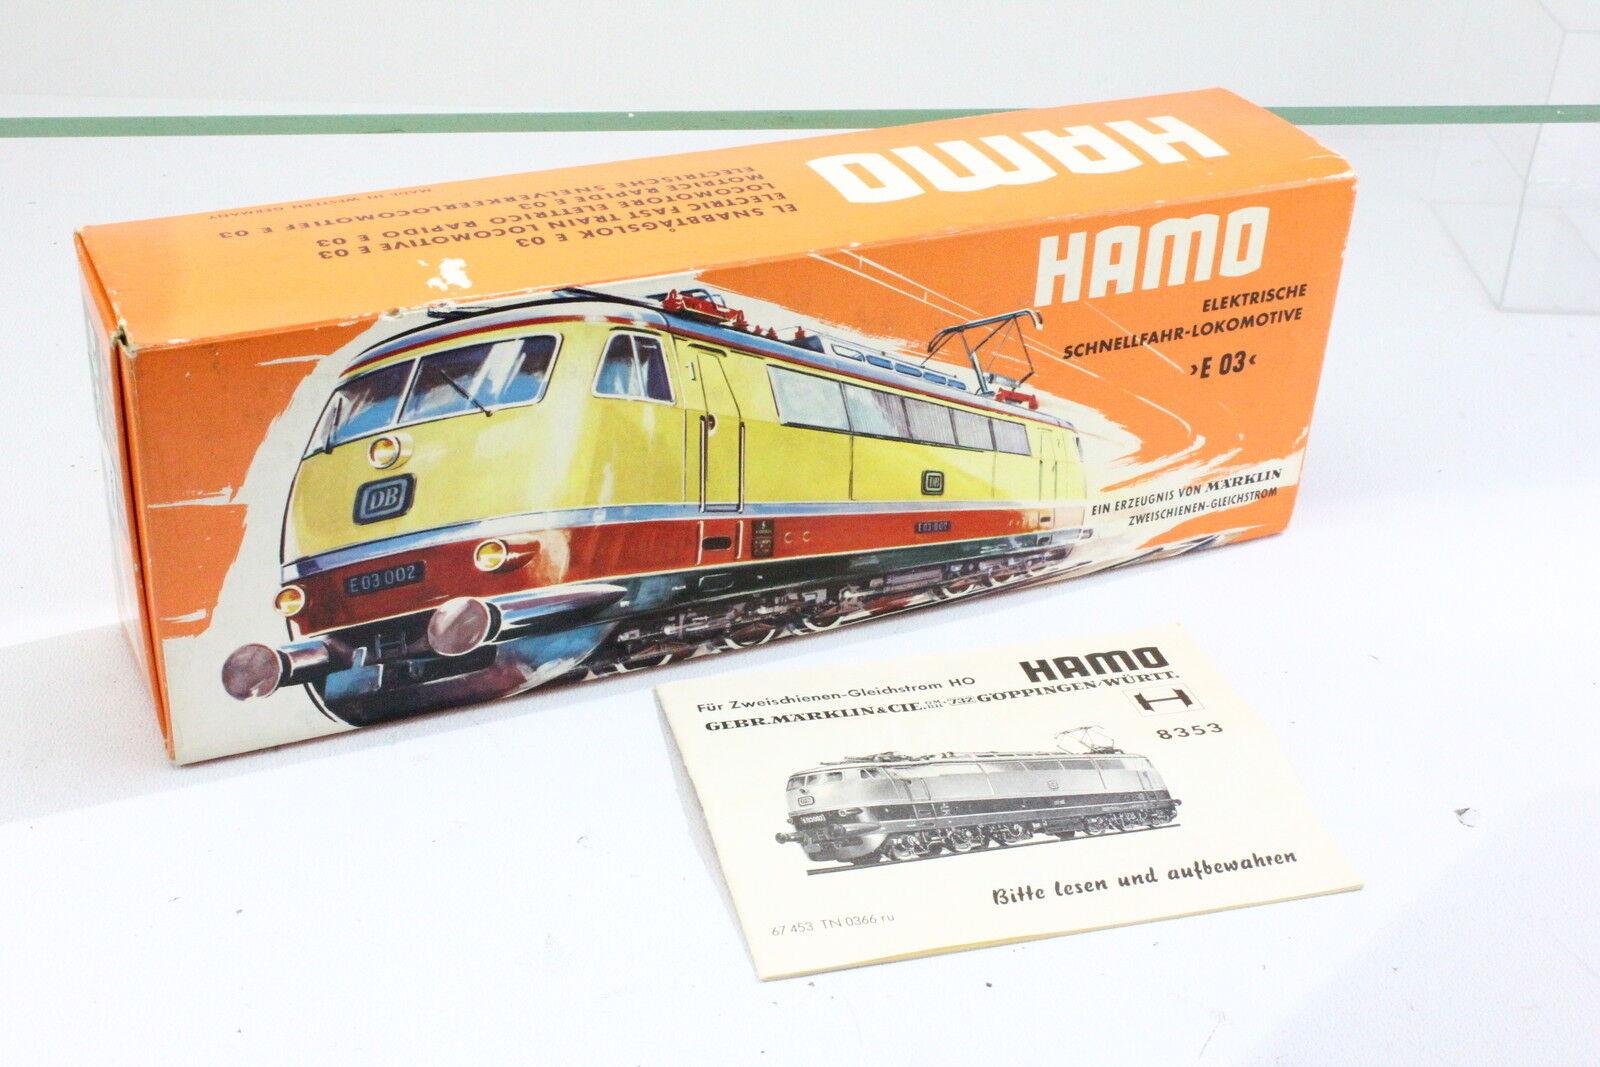 Märklin HAMO 8353 OVP Bilderkarton Orange mit mit mit Papiere für E-Lok E03 002 BR103 c96829